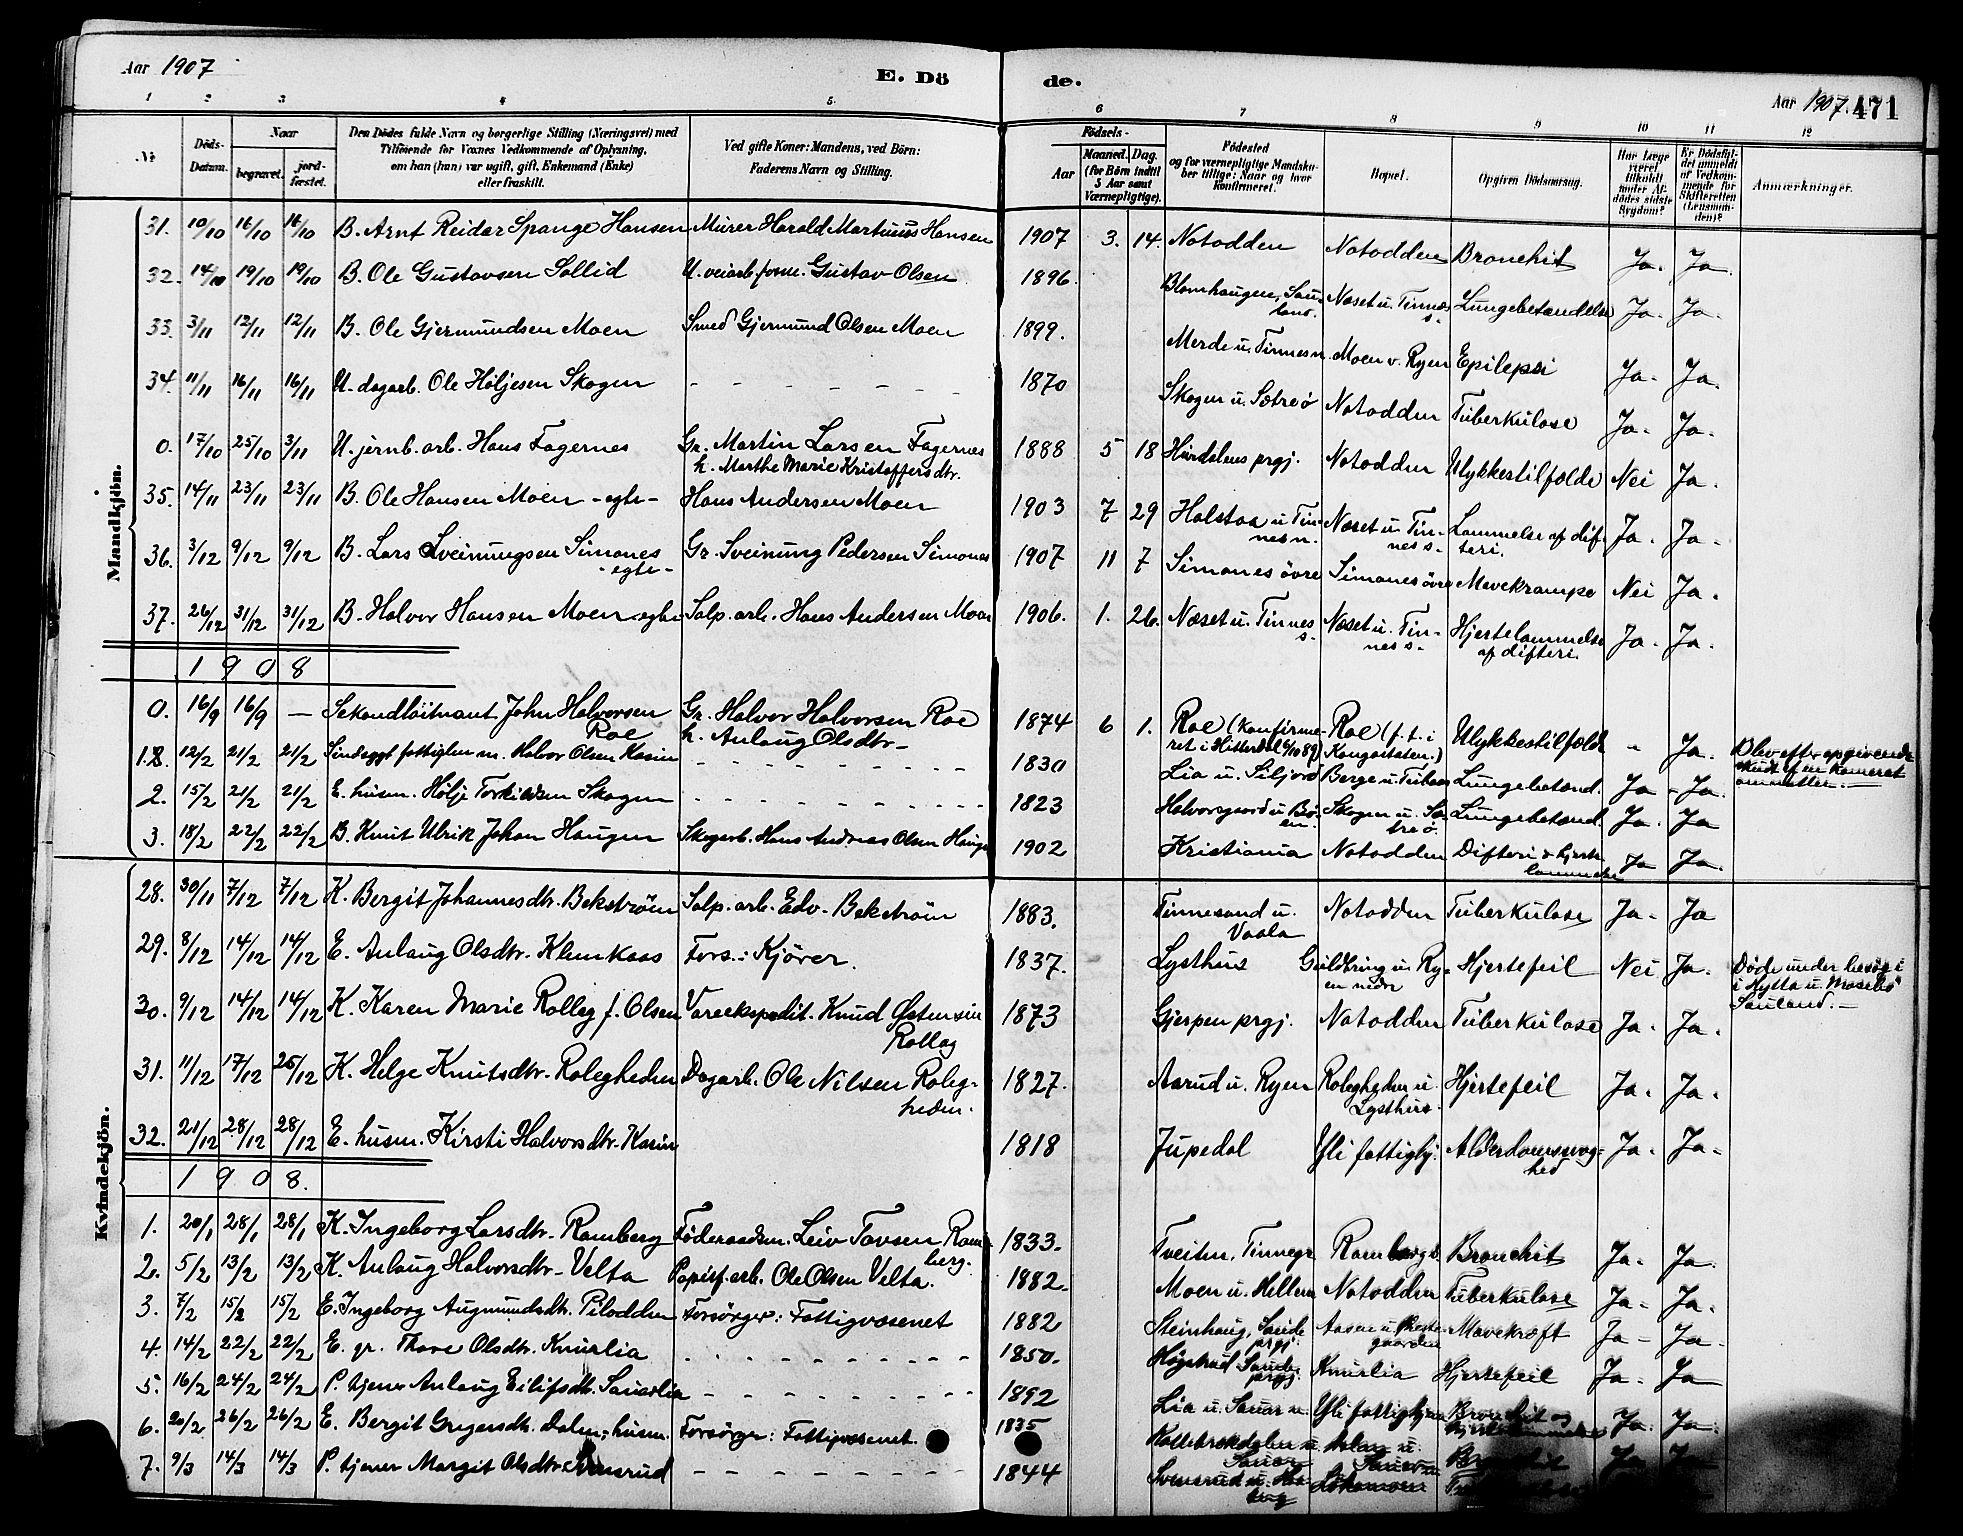 SAKO, Heddal kirkebøker, G/Ga/L0002: Klokkerbok nr. I 2, 1879-1908, s. 471